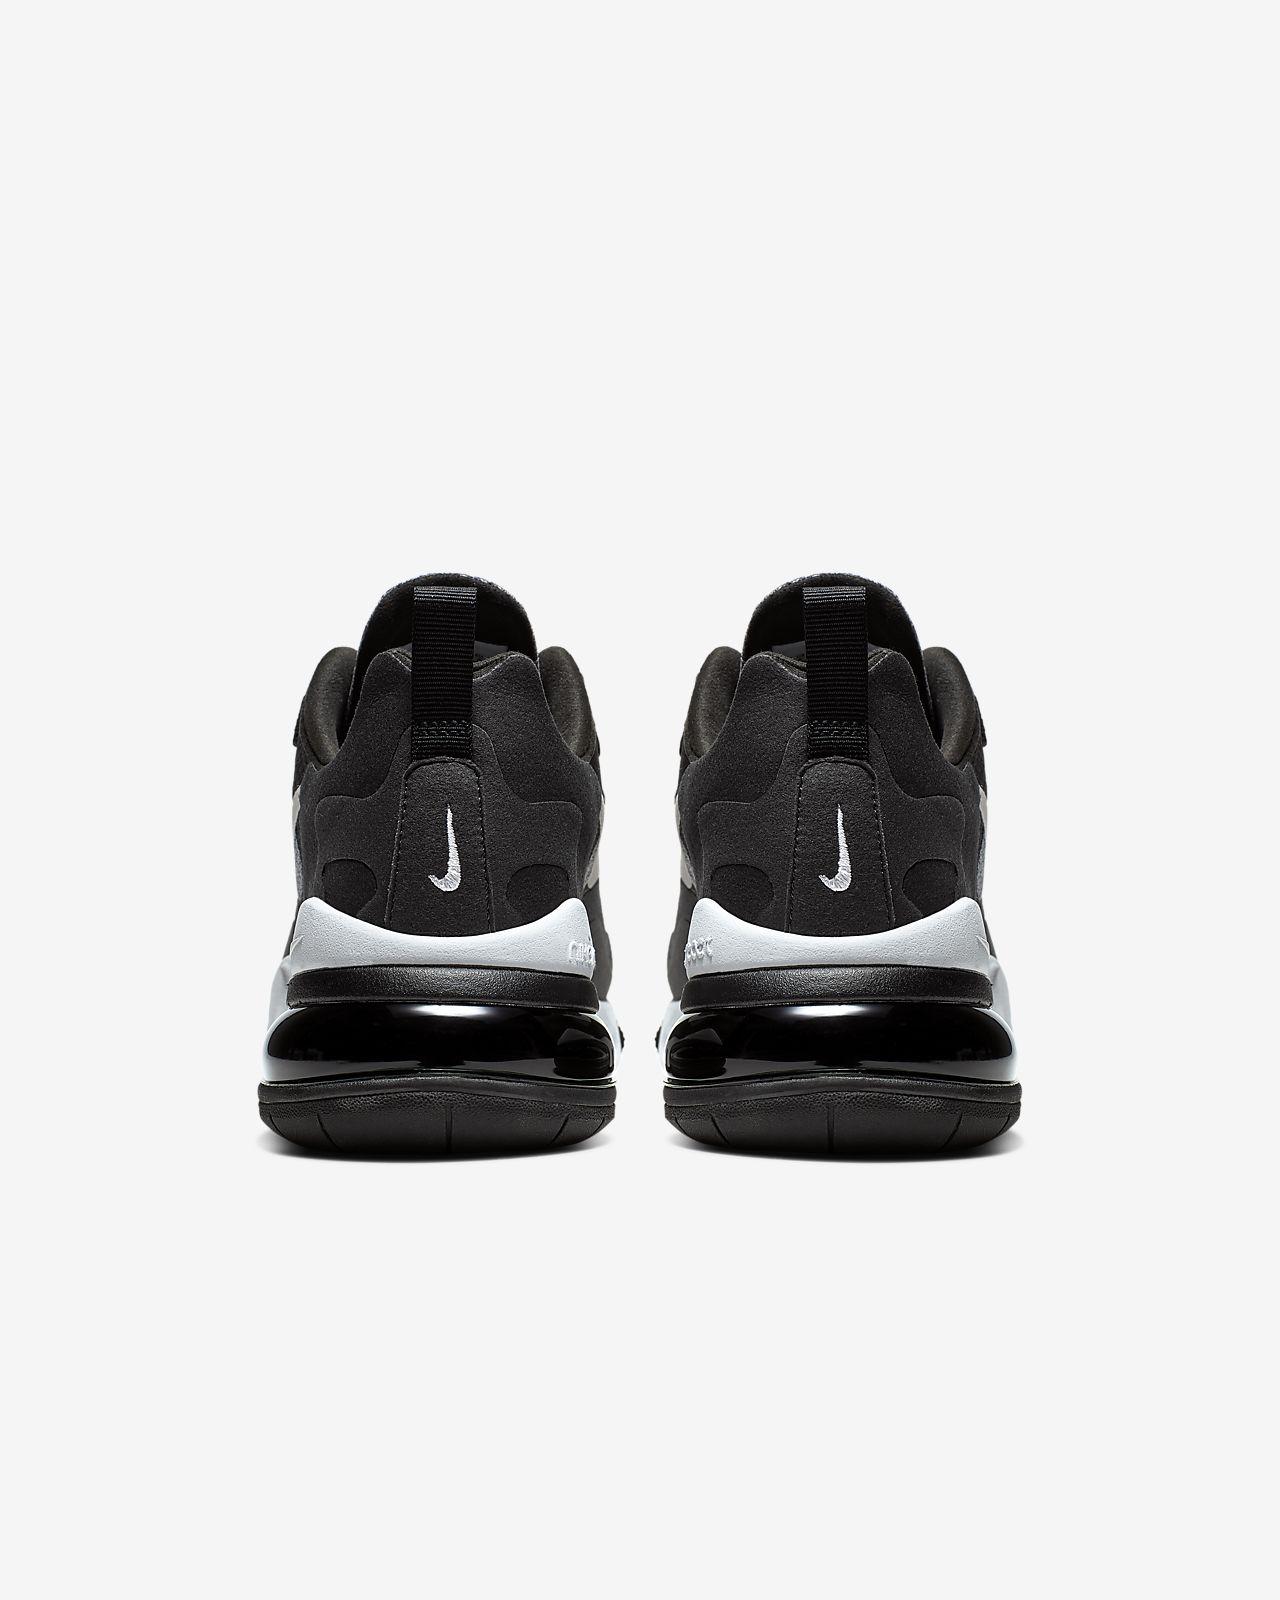 e6c81a323af6 Chaussure Nike Air Max 270 React (Optical) pour Femme. Nike.com CA